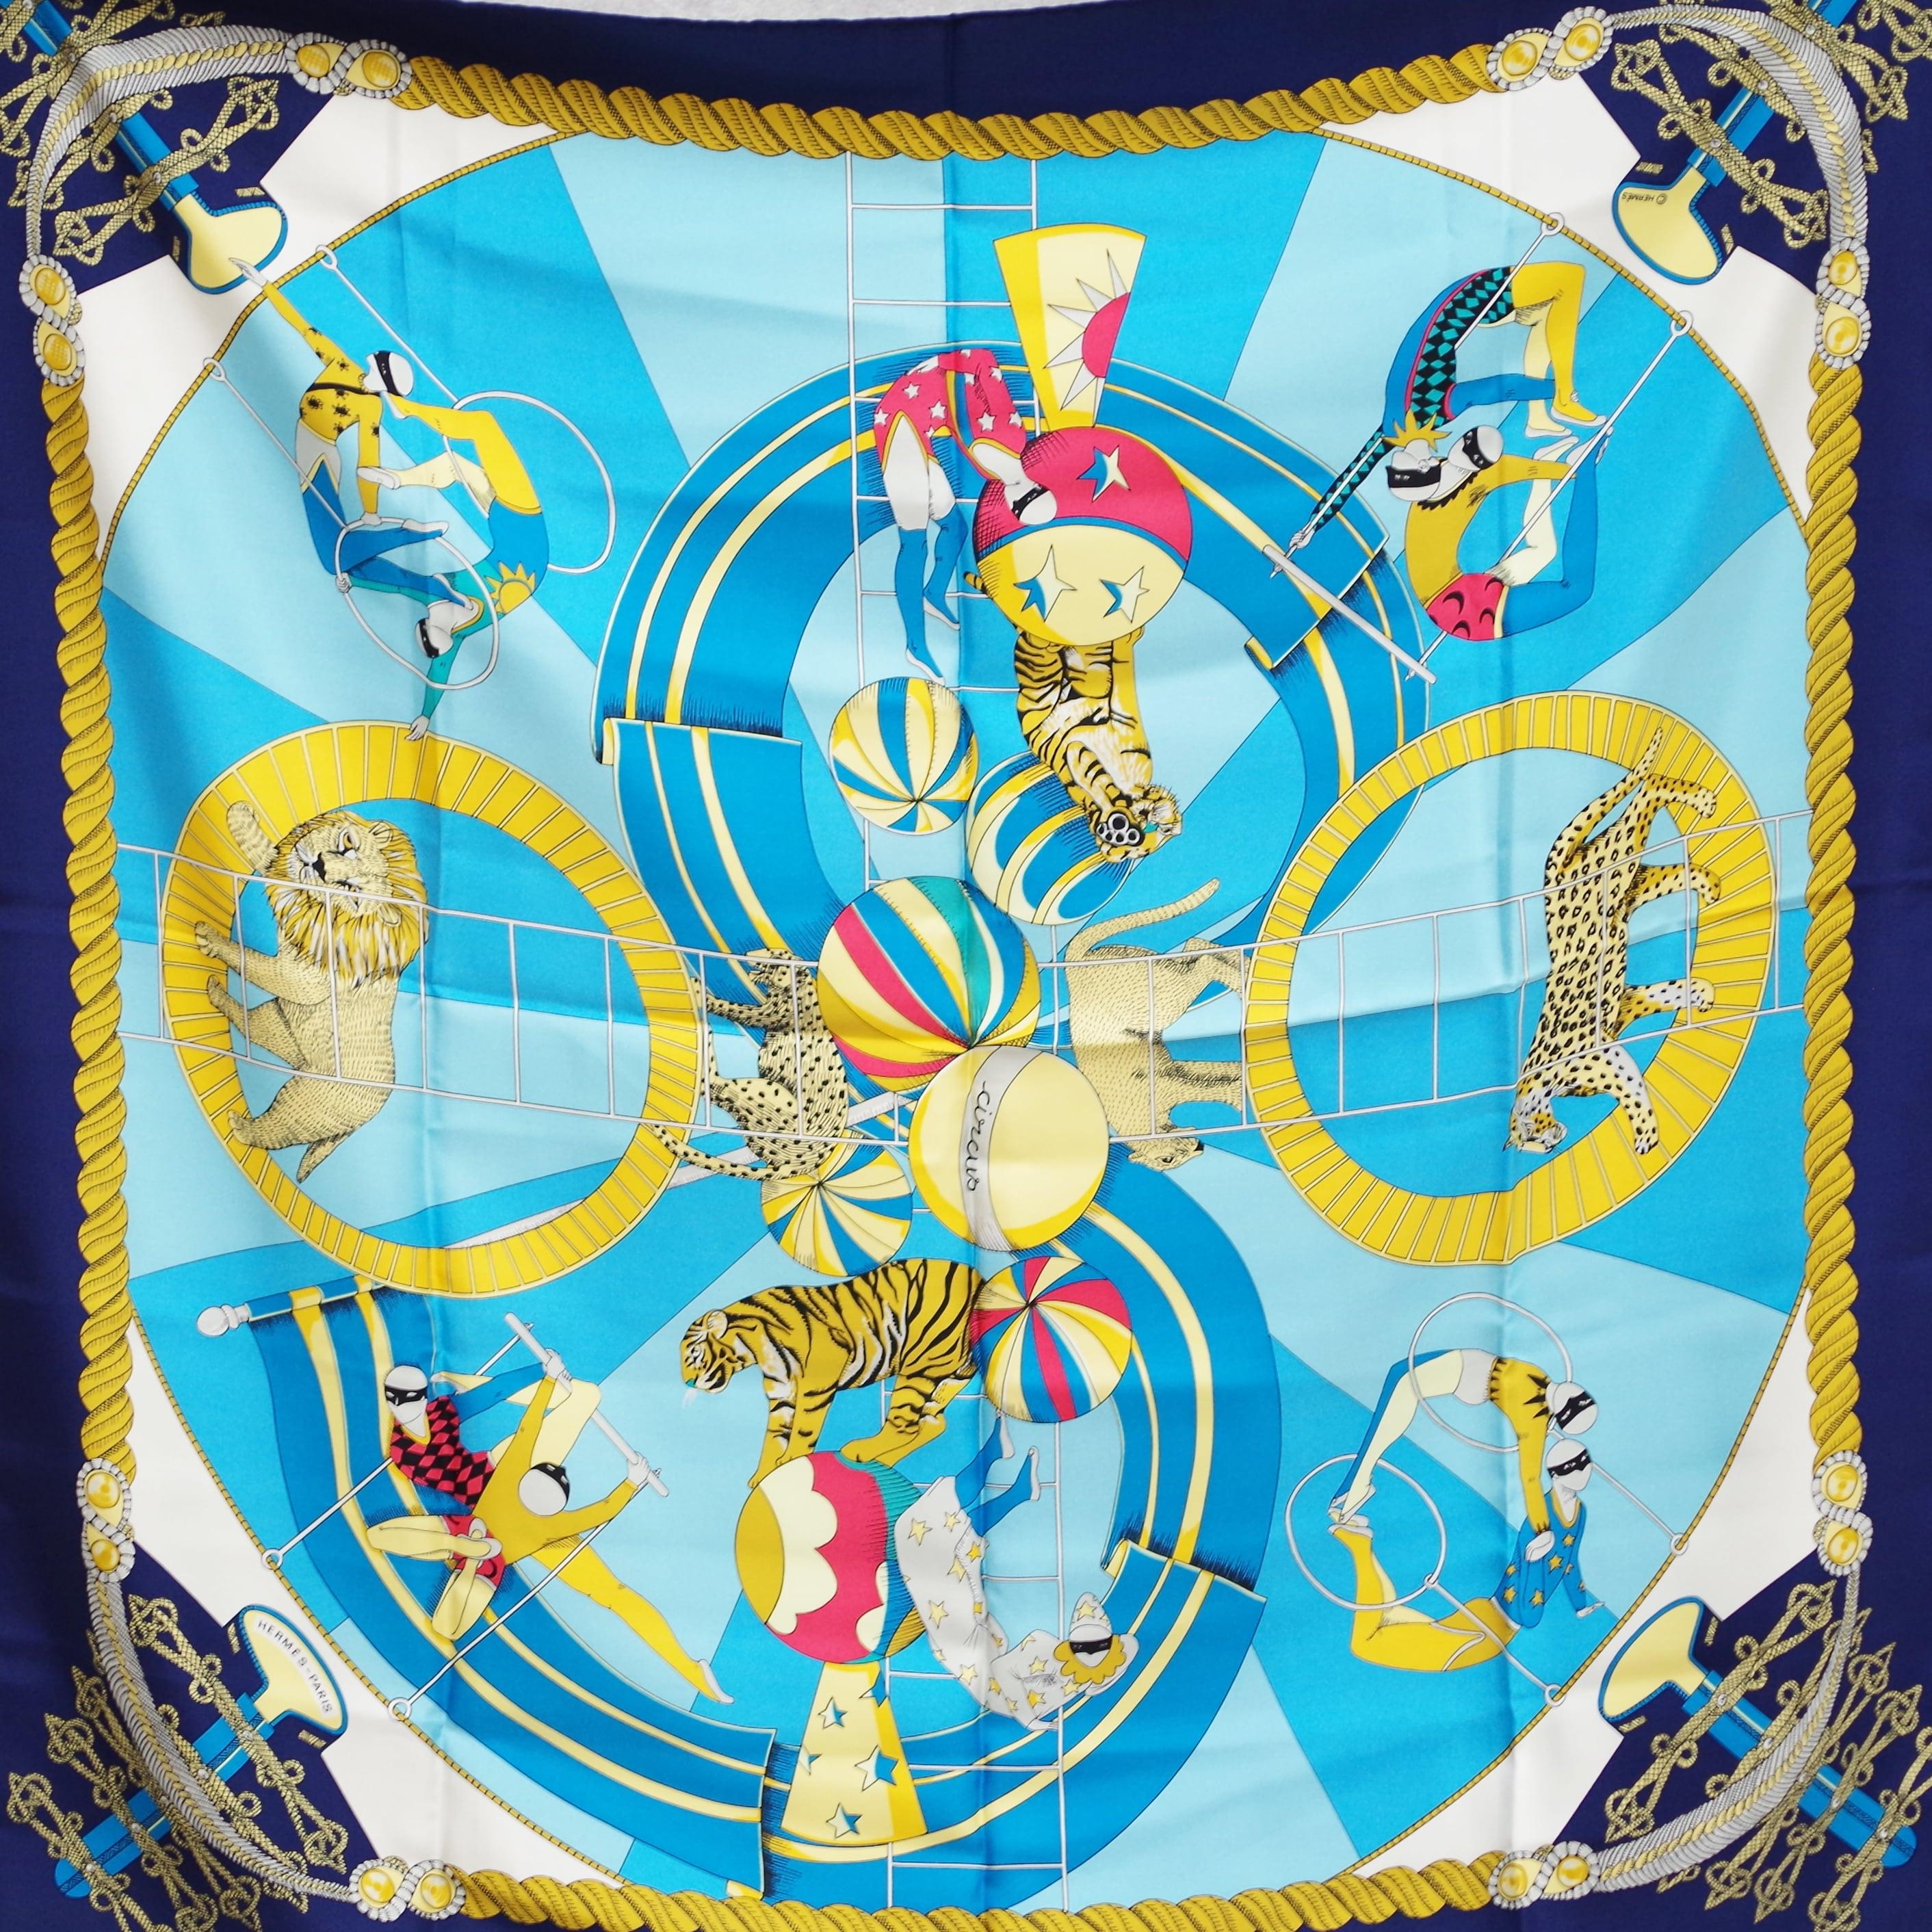 HERMES エルメス カレ 90 「サーカス」スカーフ タグなし ブルー シルク アクセサリー 小物